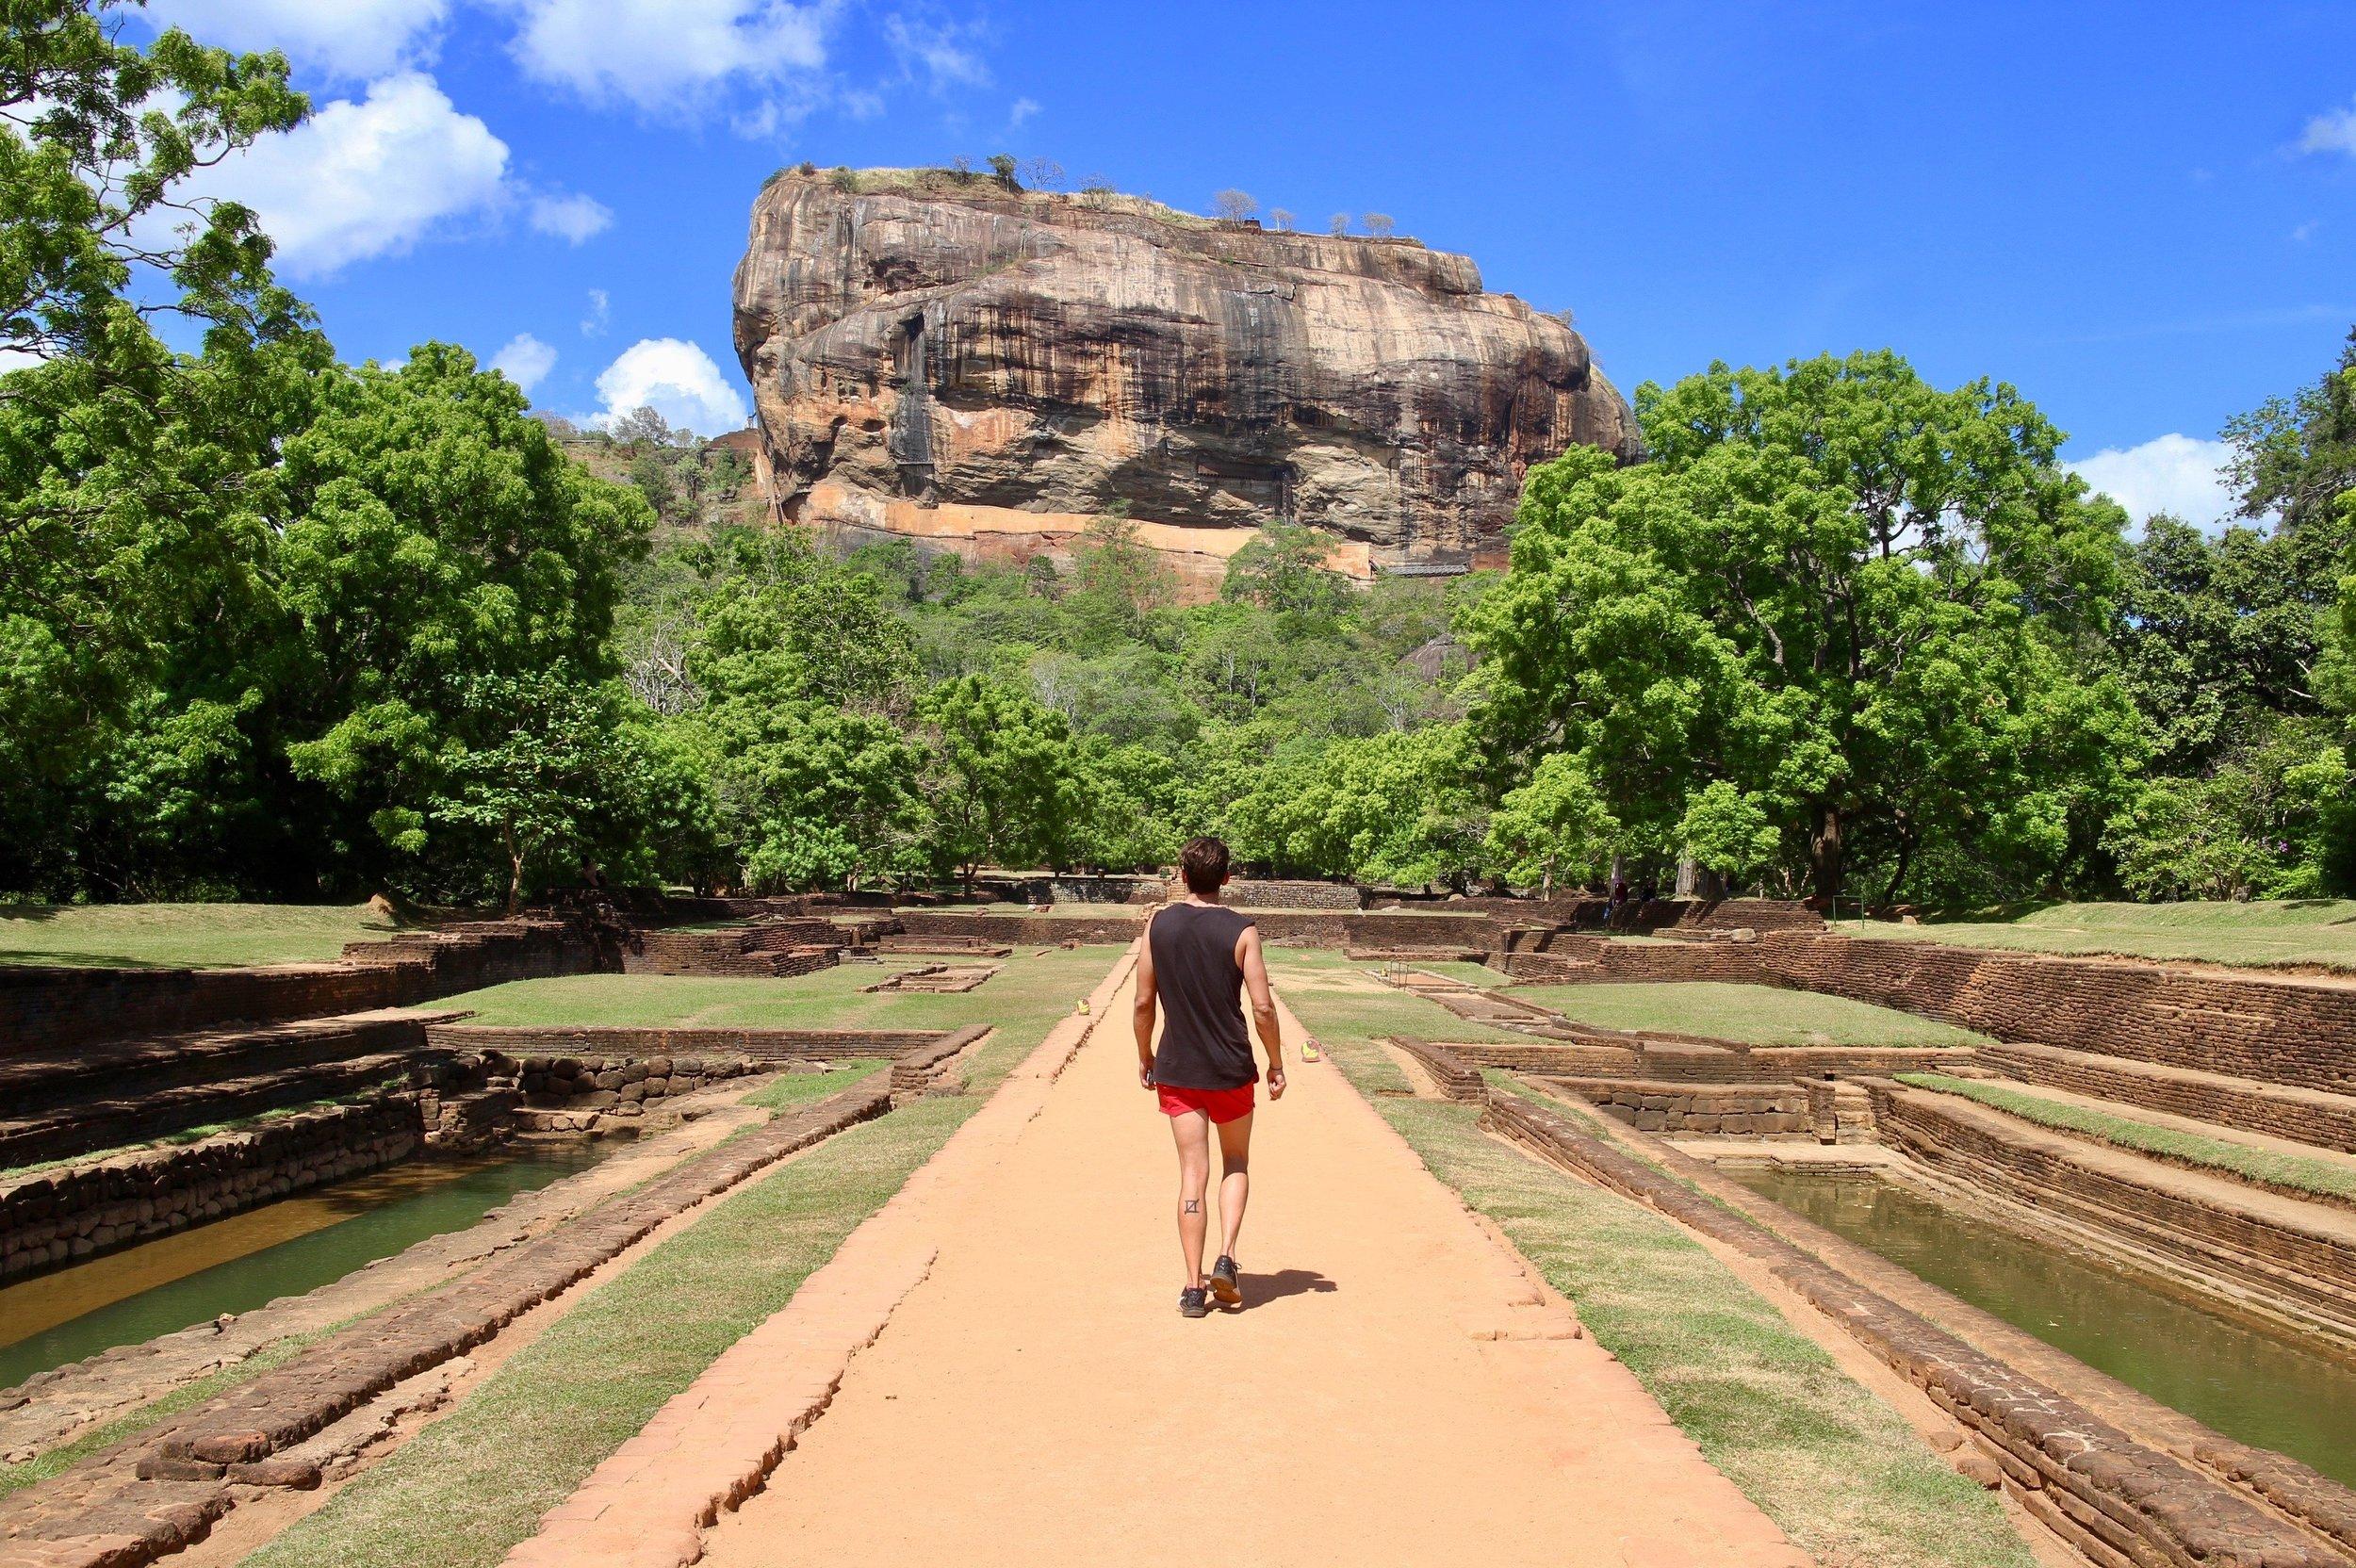 Sigiriya (or Lion Rock) from below.